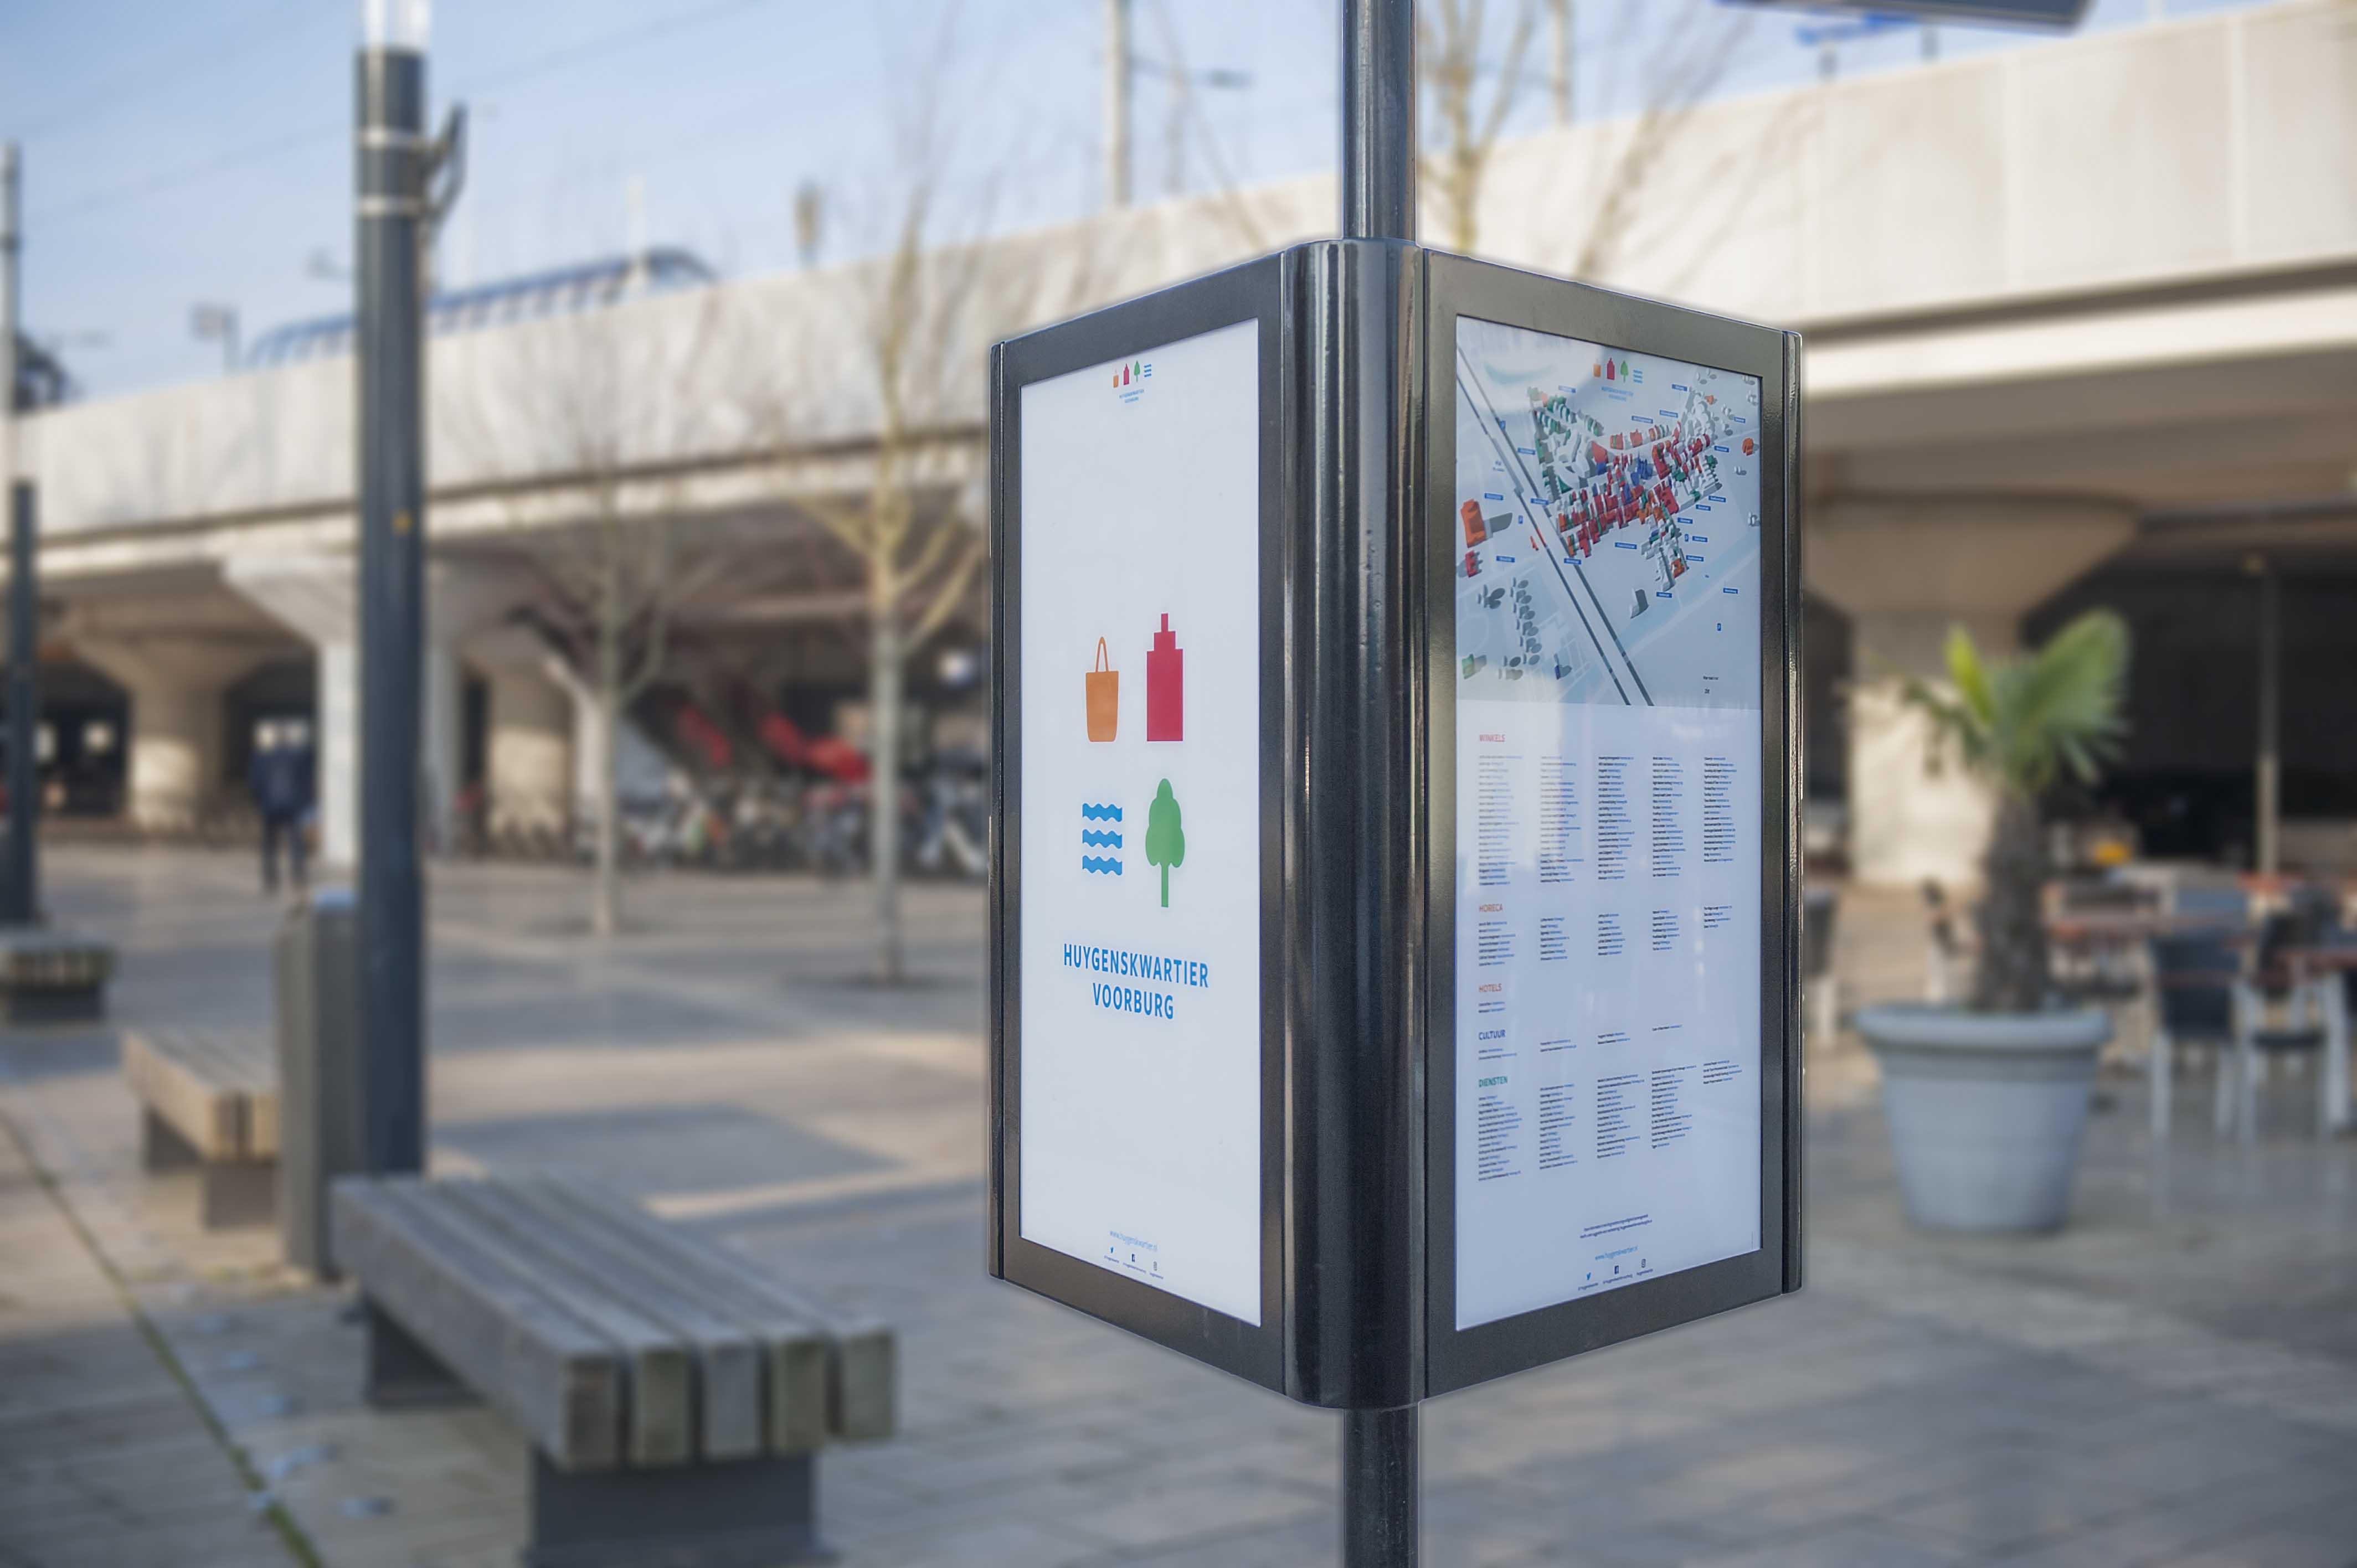 bord-stationsplein-_dsc7370_corr2